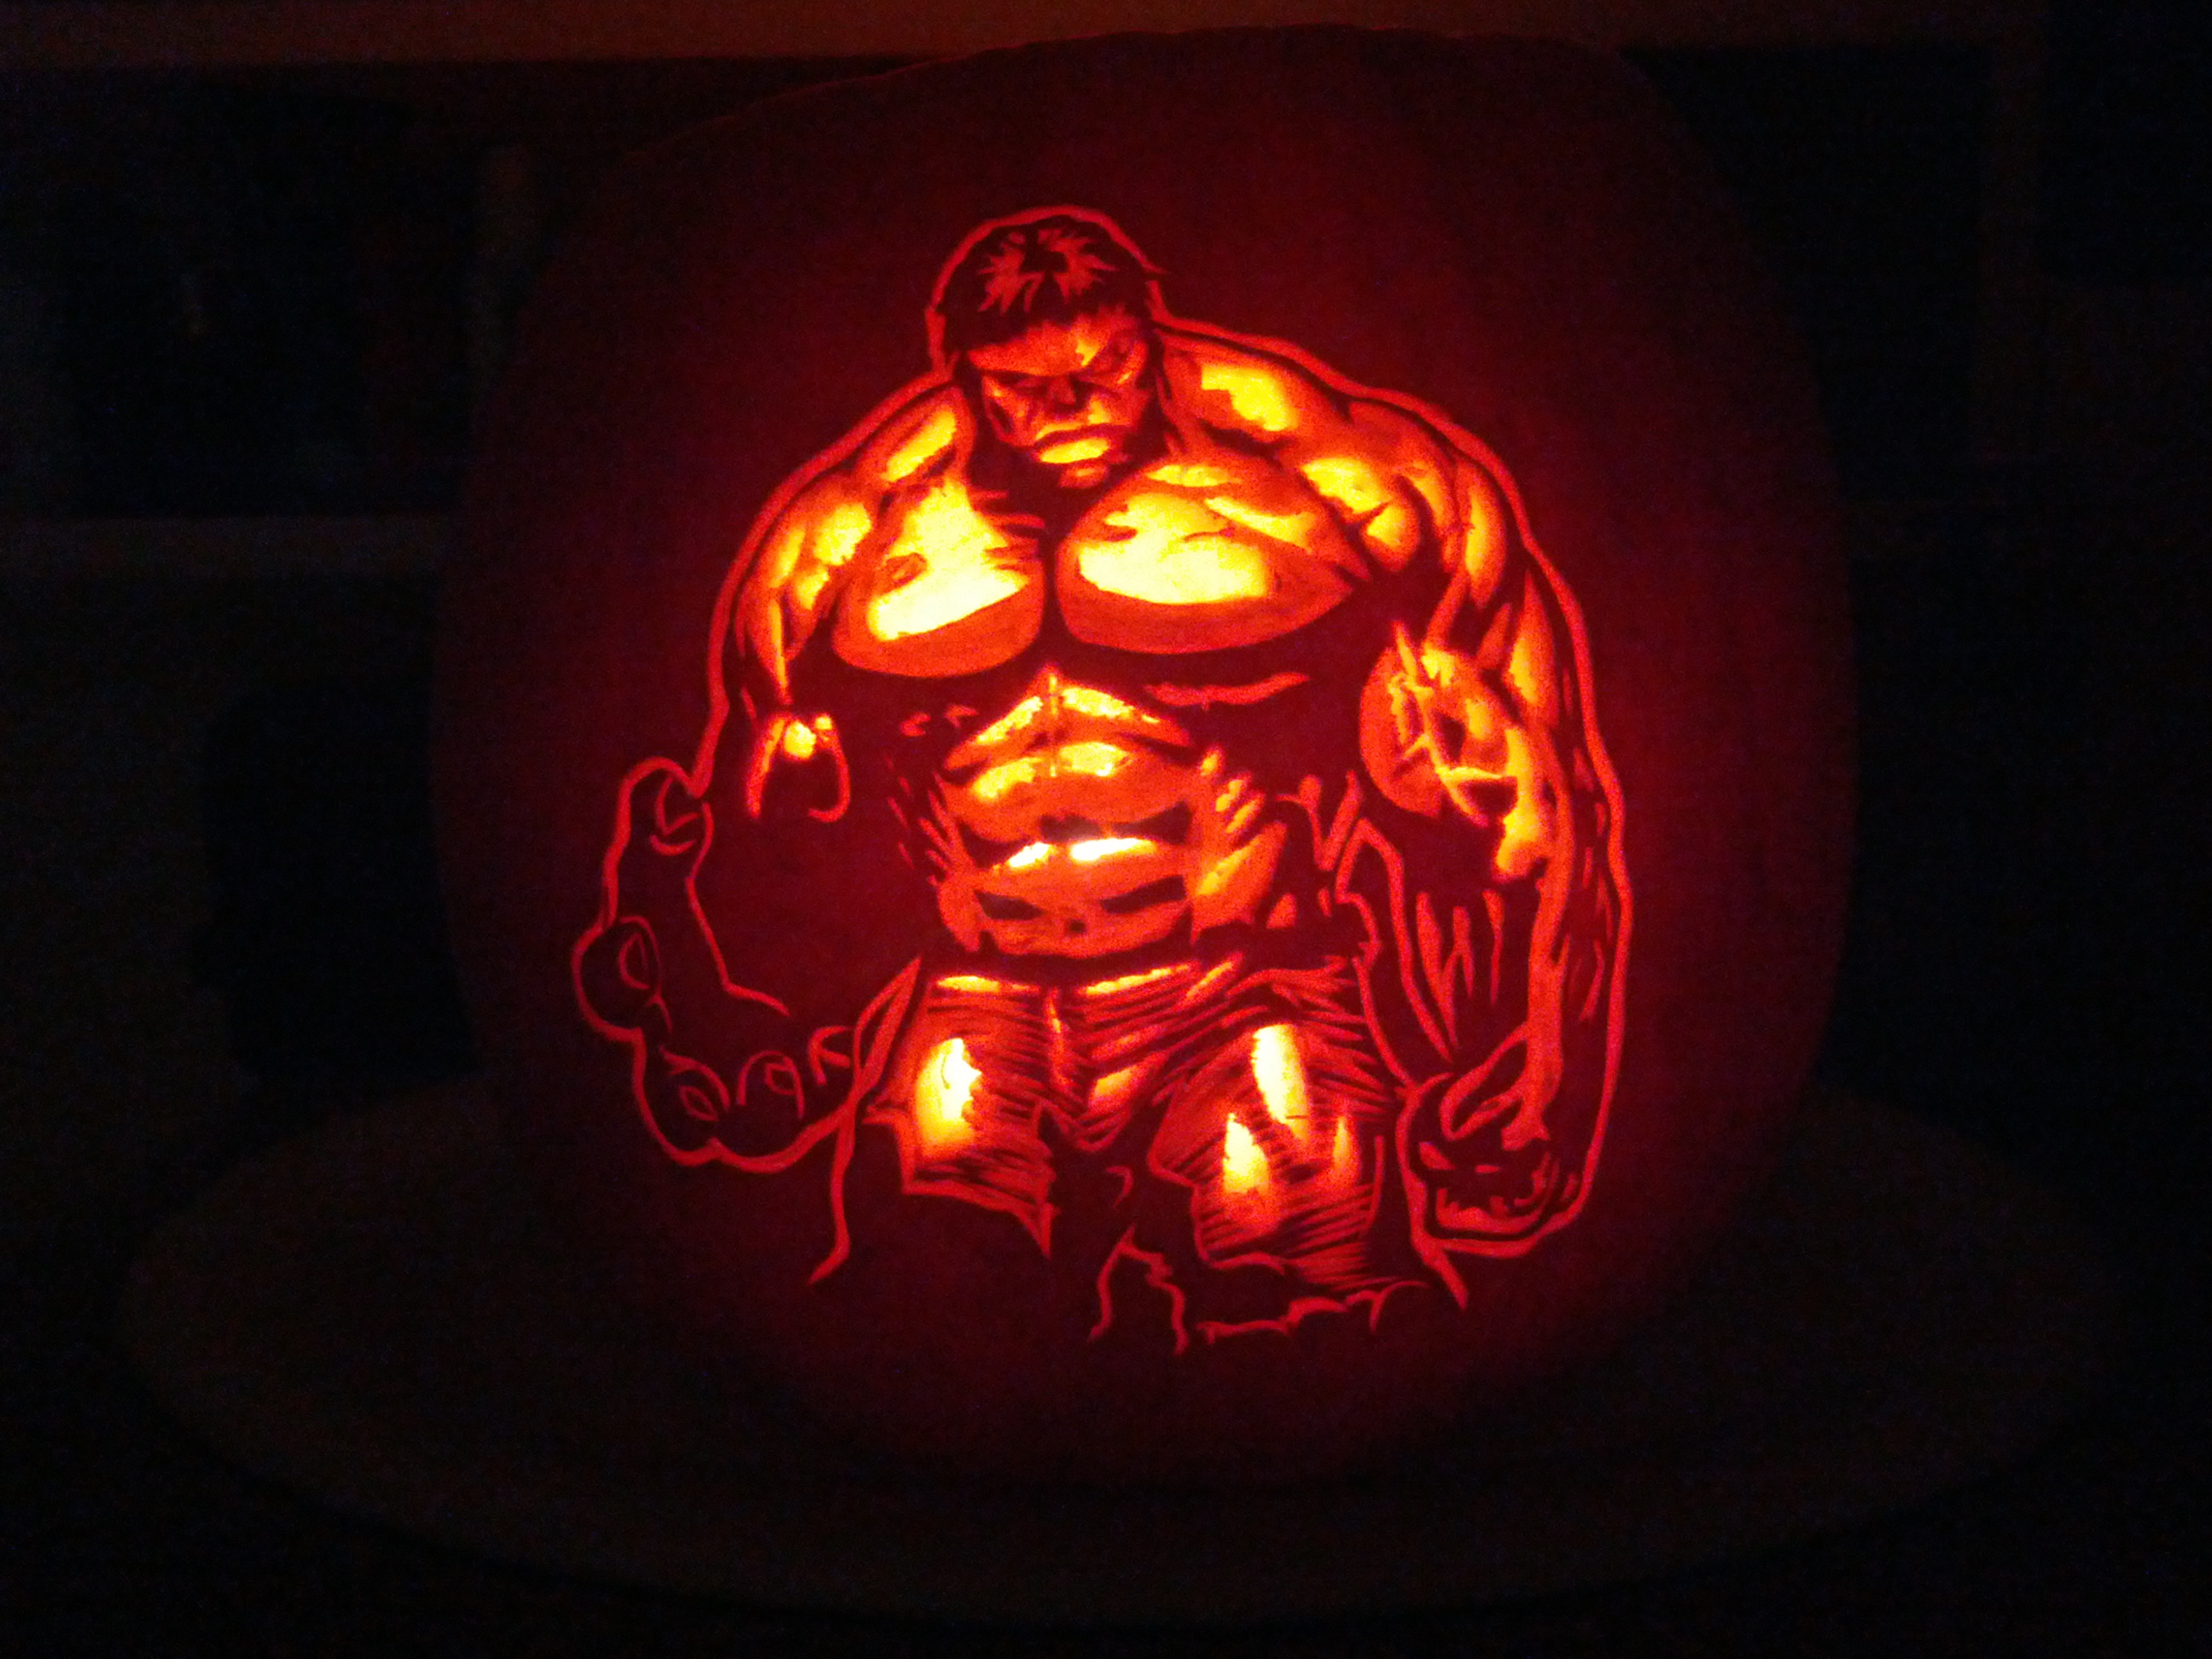 Hulk smash the carving